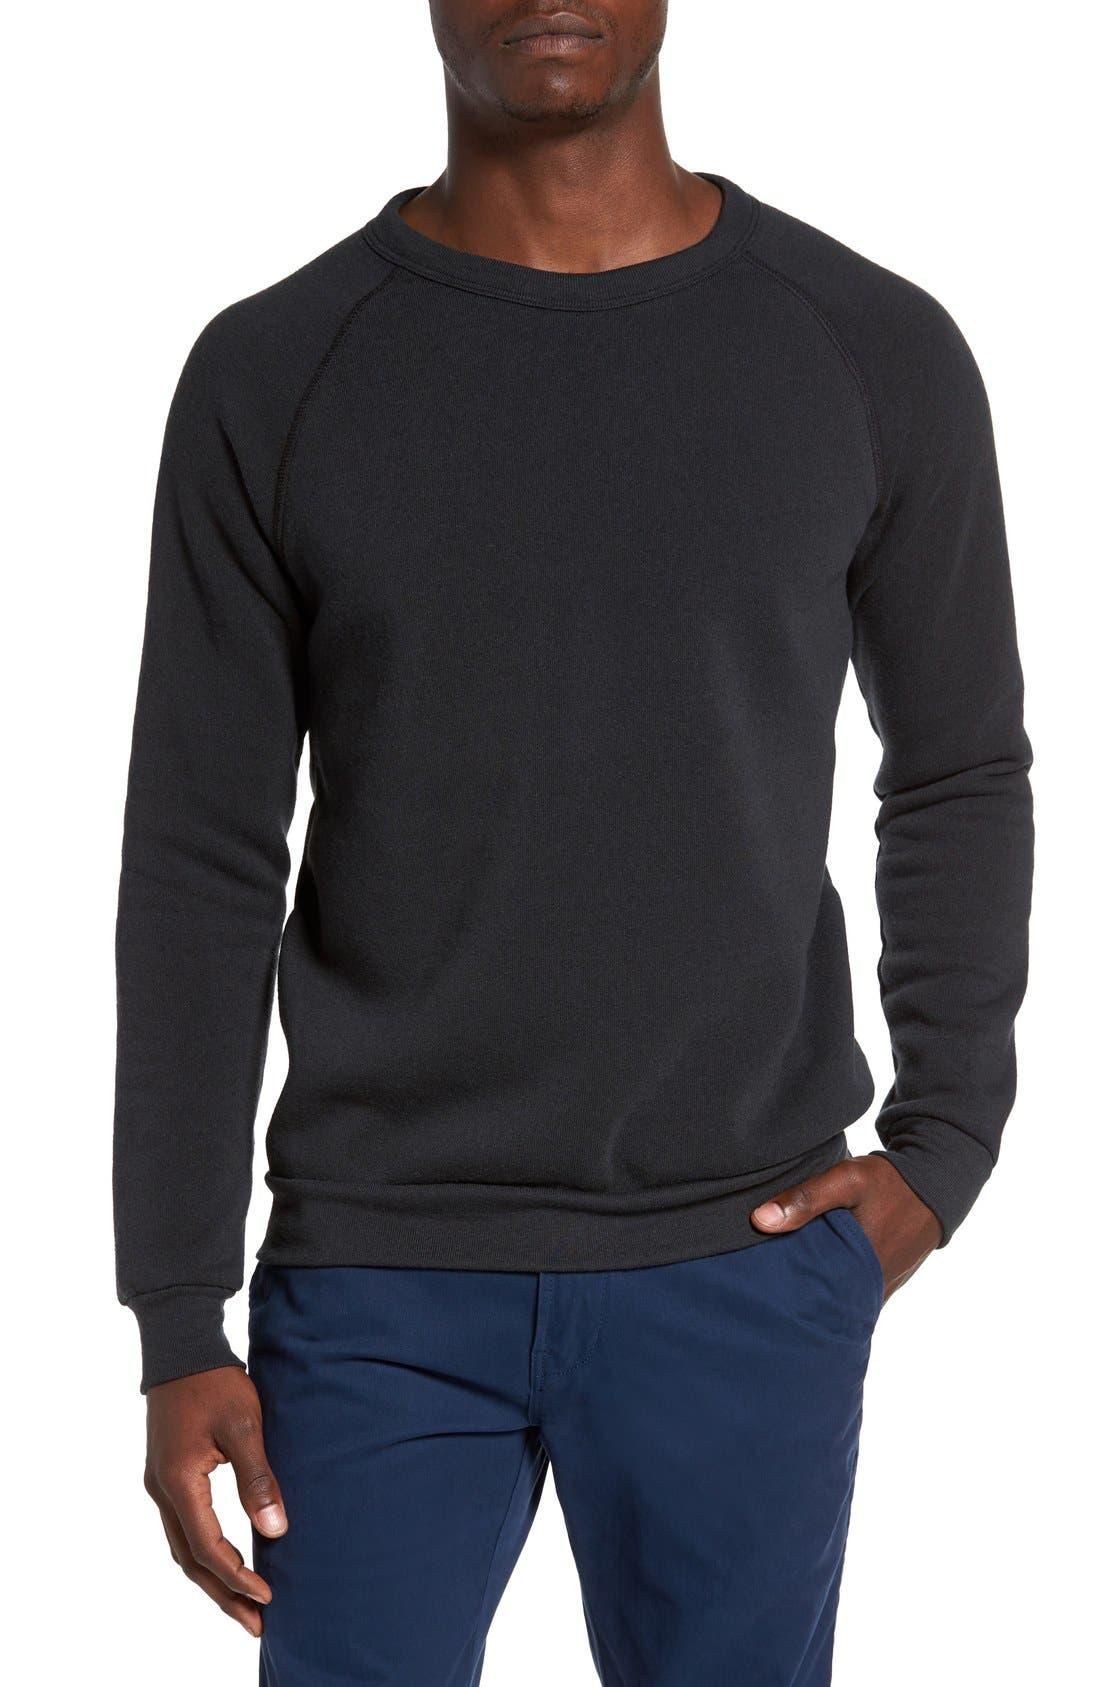 Alternate Image 1 Selected - Alternative 'The Champ' Sweatshirt